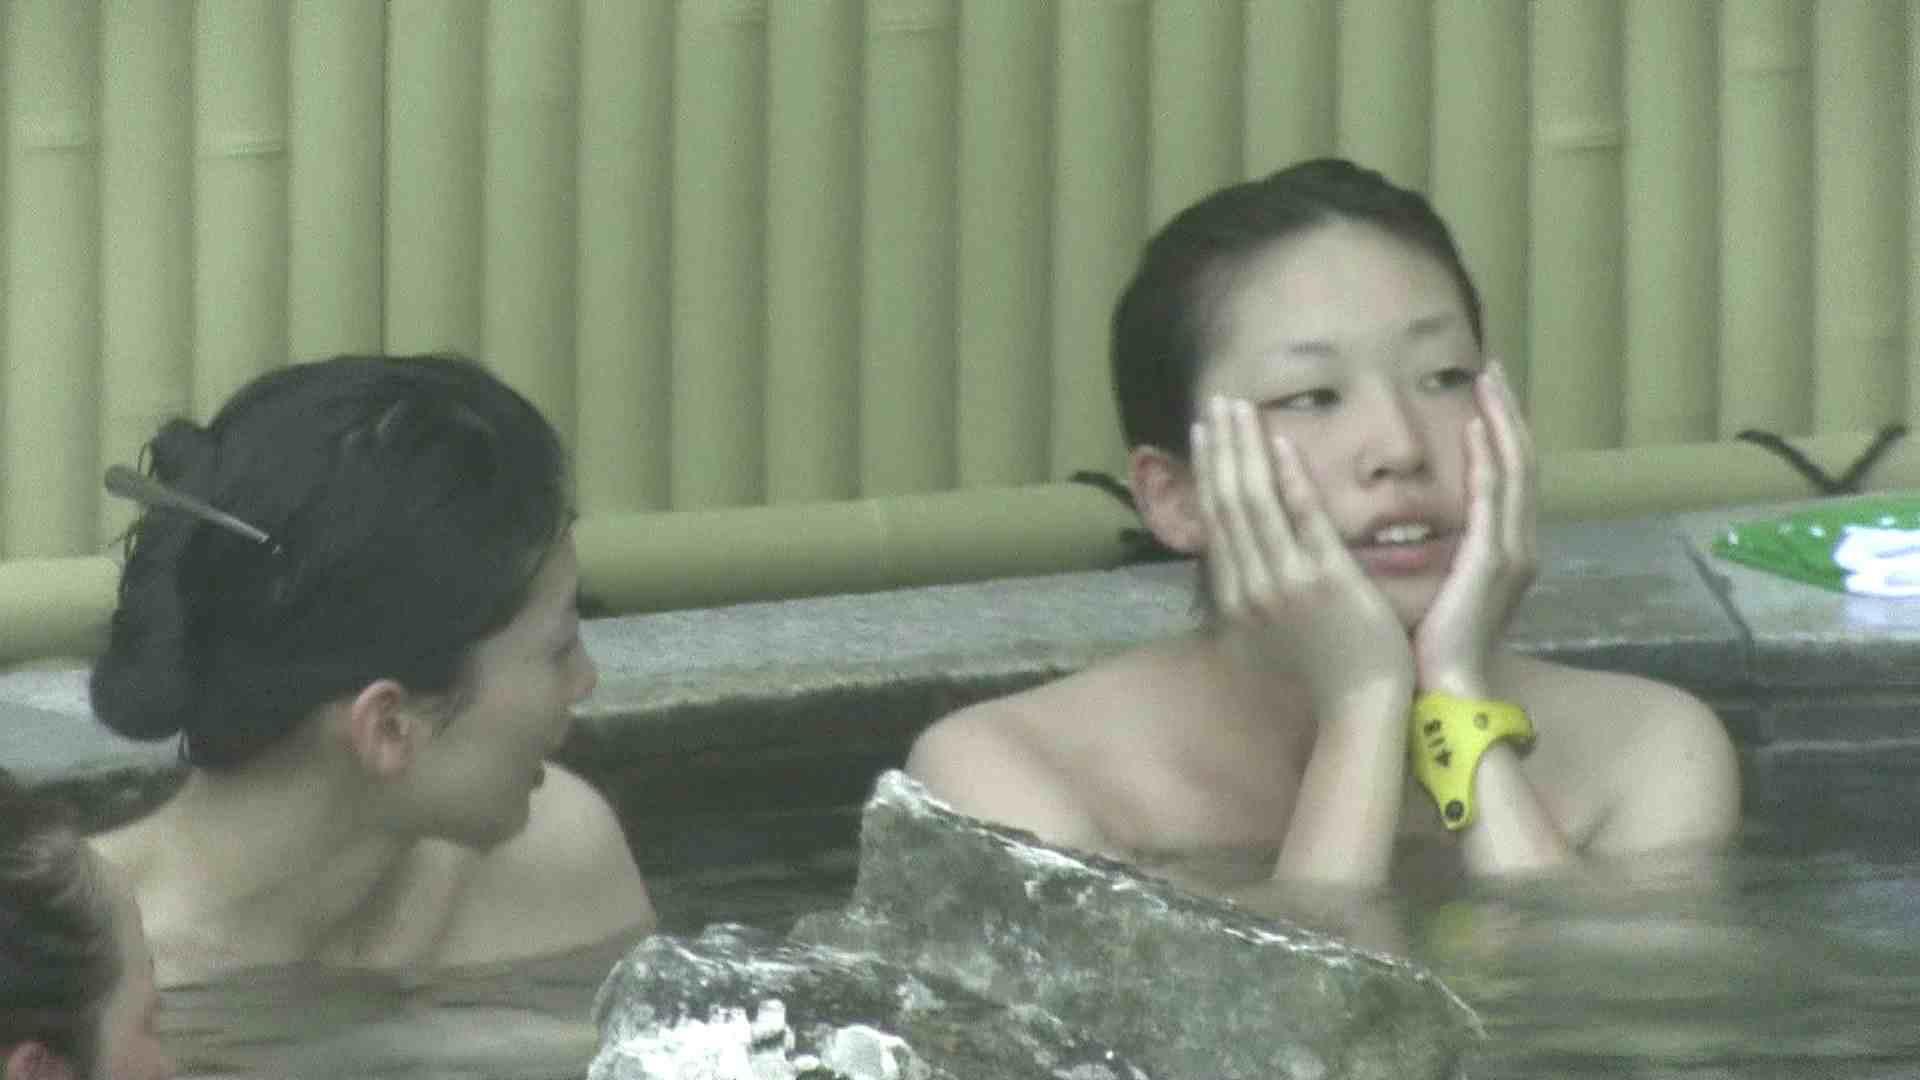 Aquaな露天風呂Vol.195 OLセックス 盗撮ワレメ無修正動画無料 71画像 23